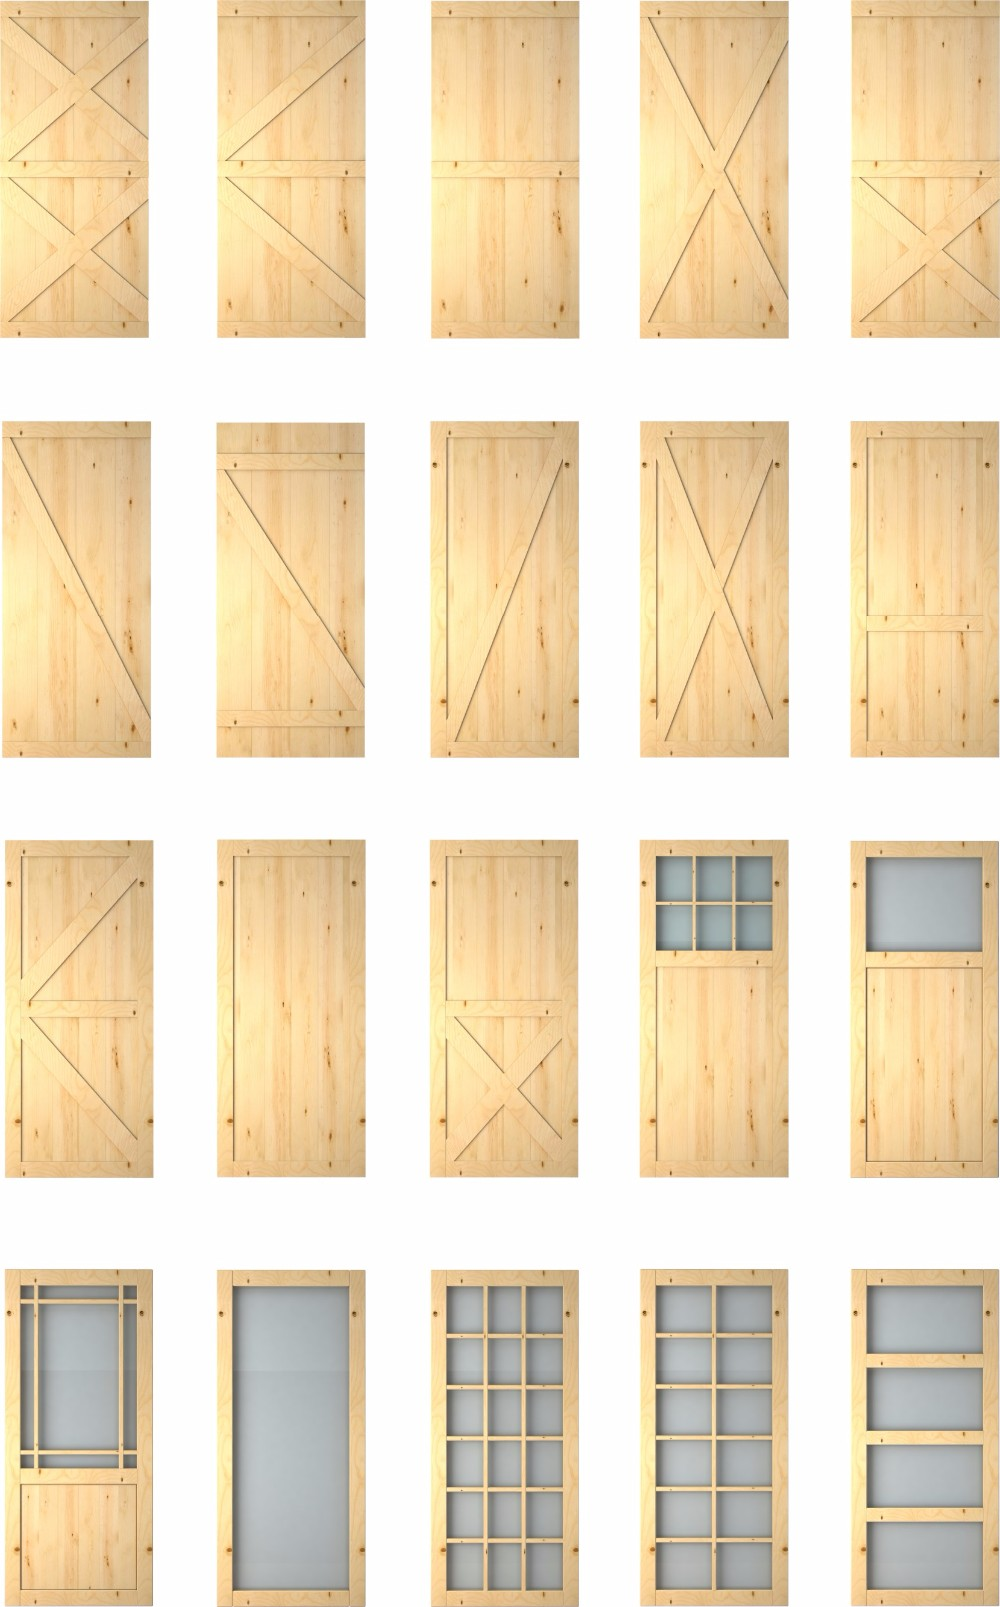 Elegant White Insulated Balcony Sliding Glass Door,Barn Wood Door ...